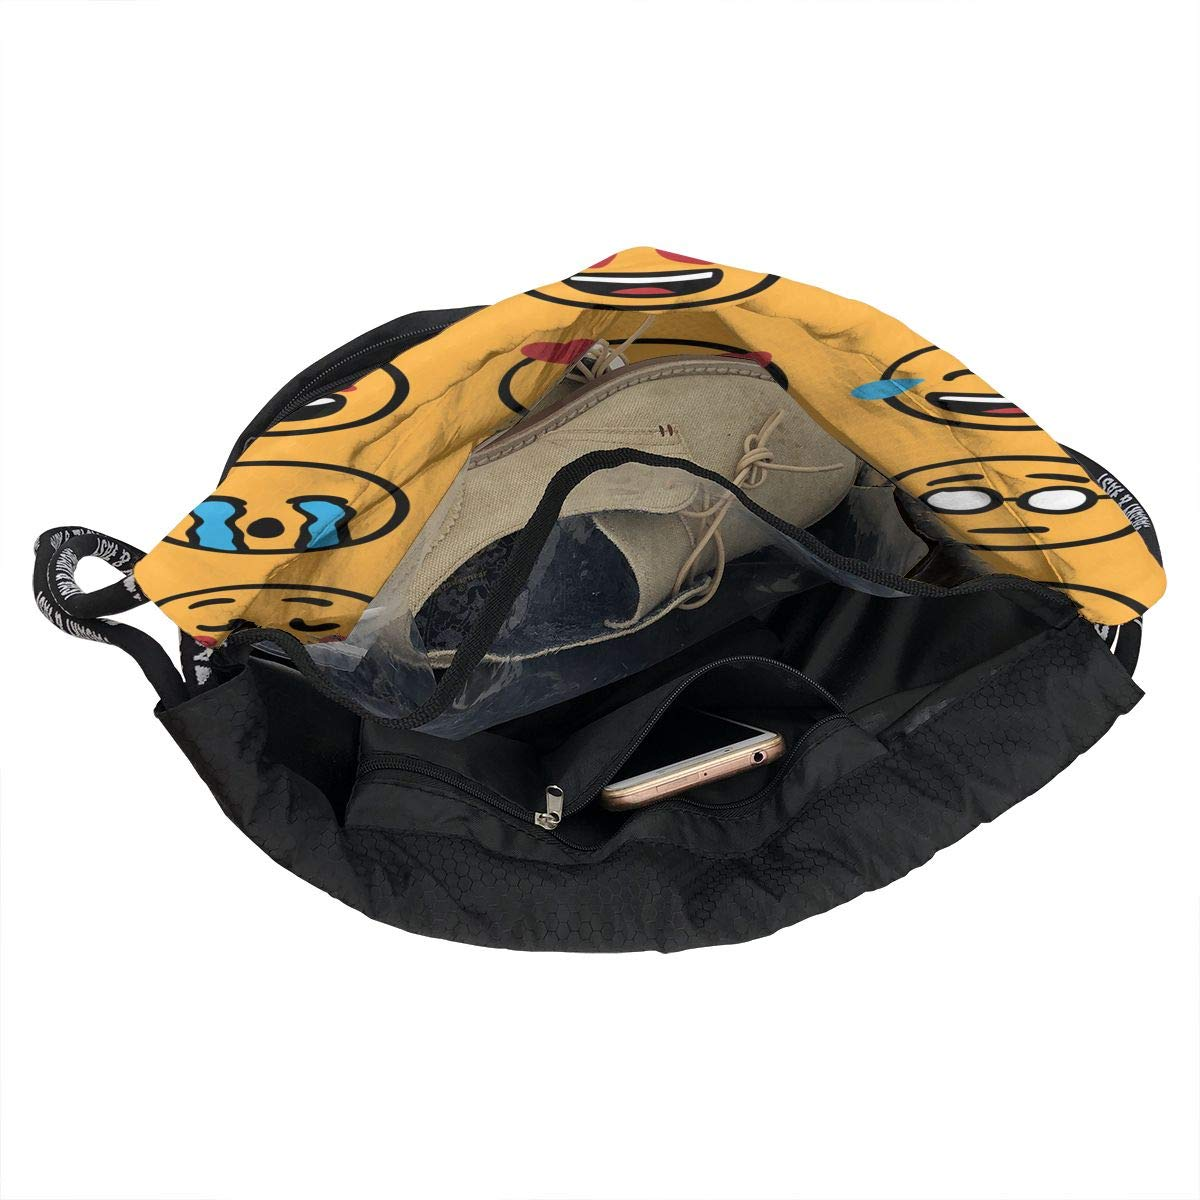 Large /& Waterproof Gymsack Sackpack Backpack Cinch Sack For School Gym Travel 2 Drawstring Bag For Men /& Women Emoji